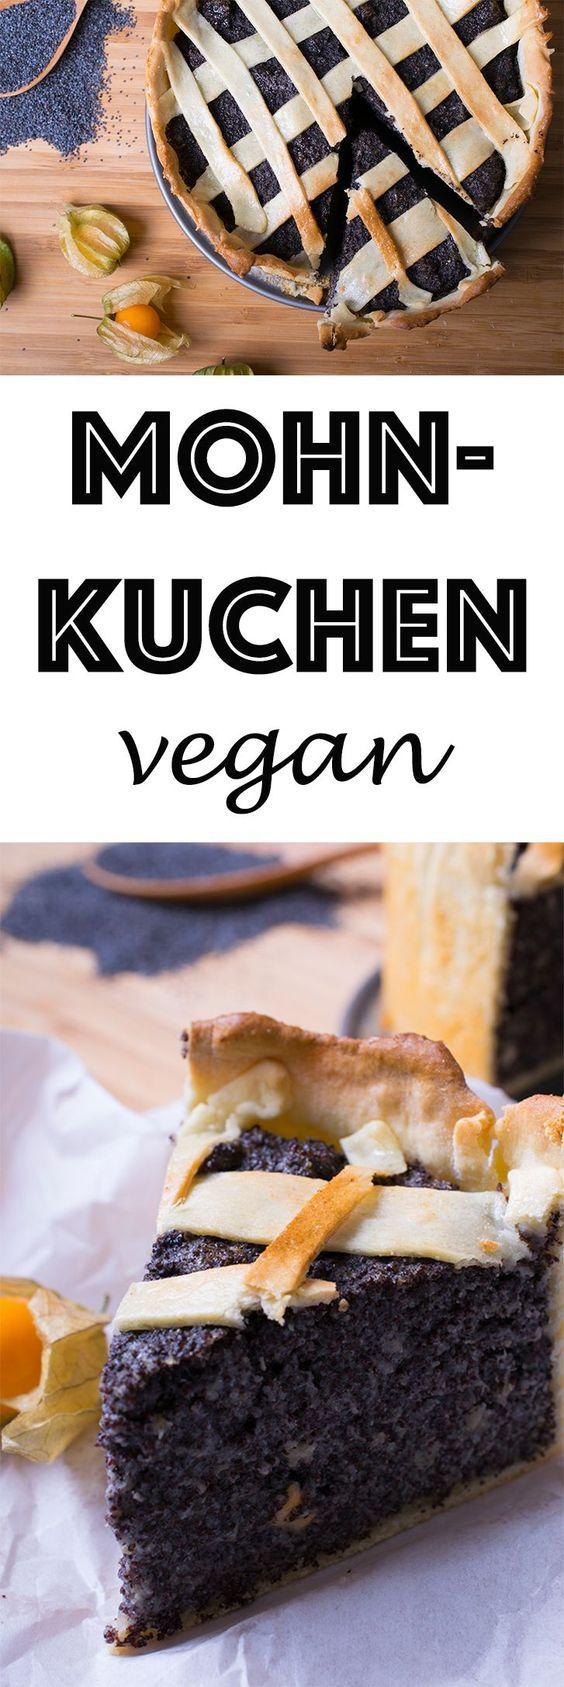 Endlich: Gesunder & Veganer Mohnkuchen – *** Veganer Mohnkuchen mit …